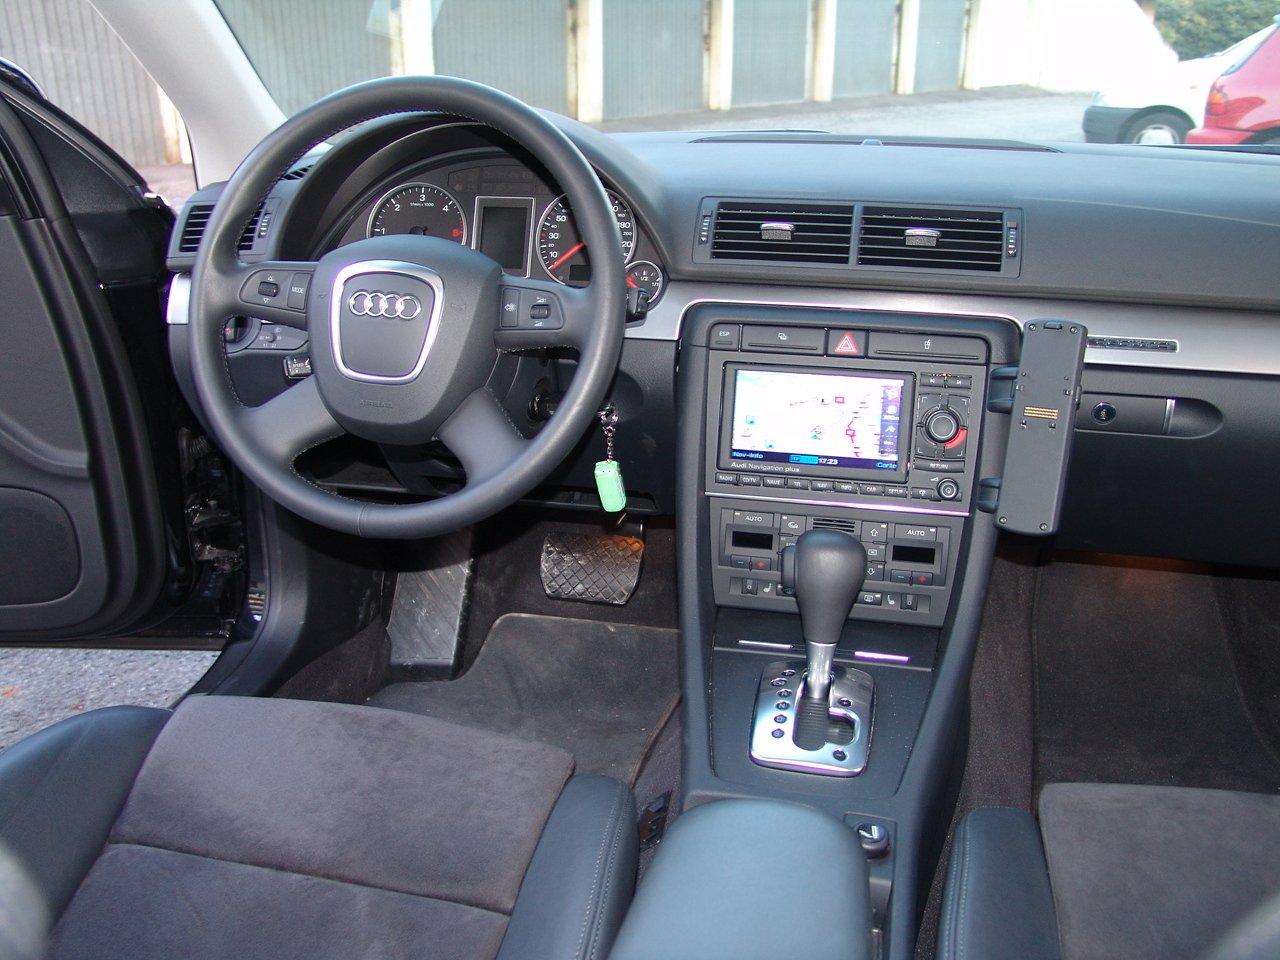 Str Essai Audi A4 2 0 Amp 2 5 Tdi Multitronic Rappel 3 0